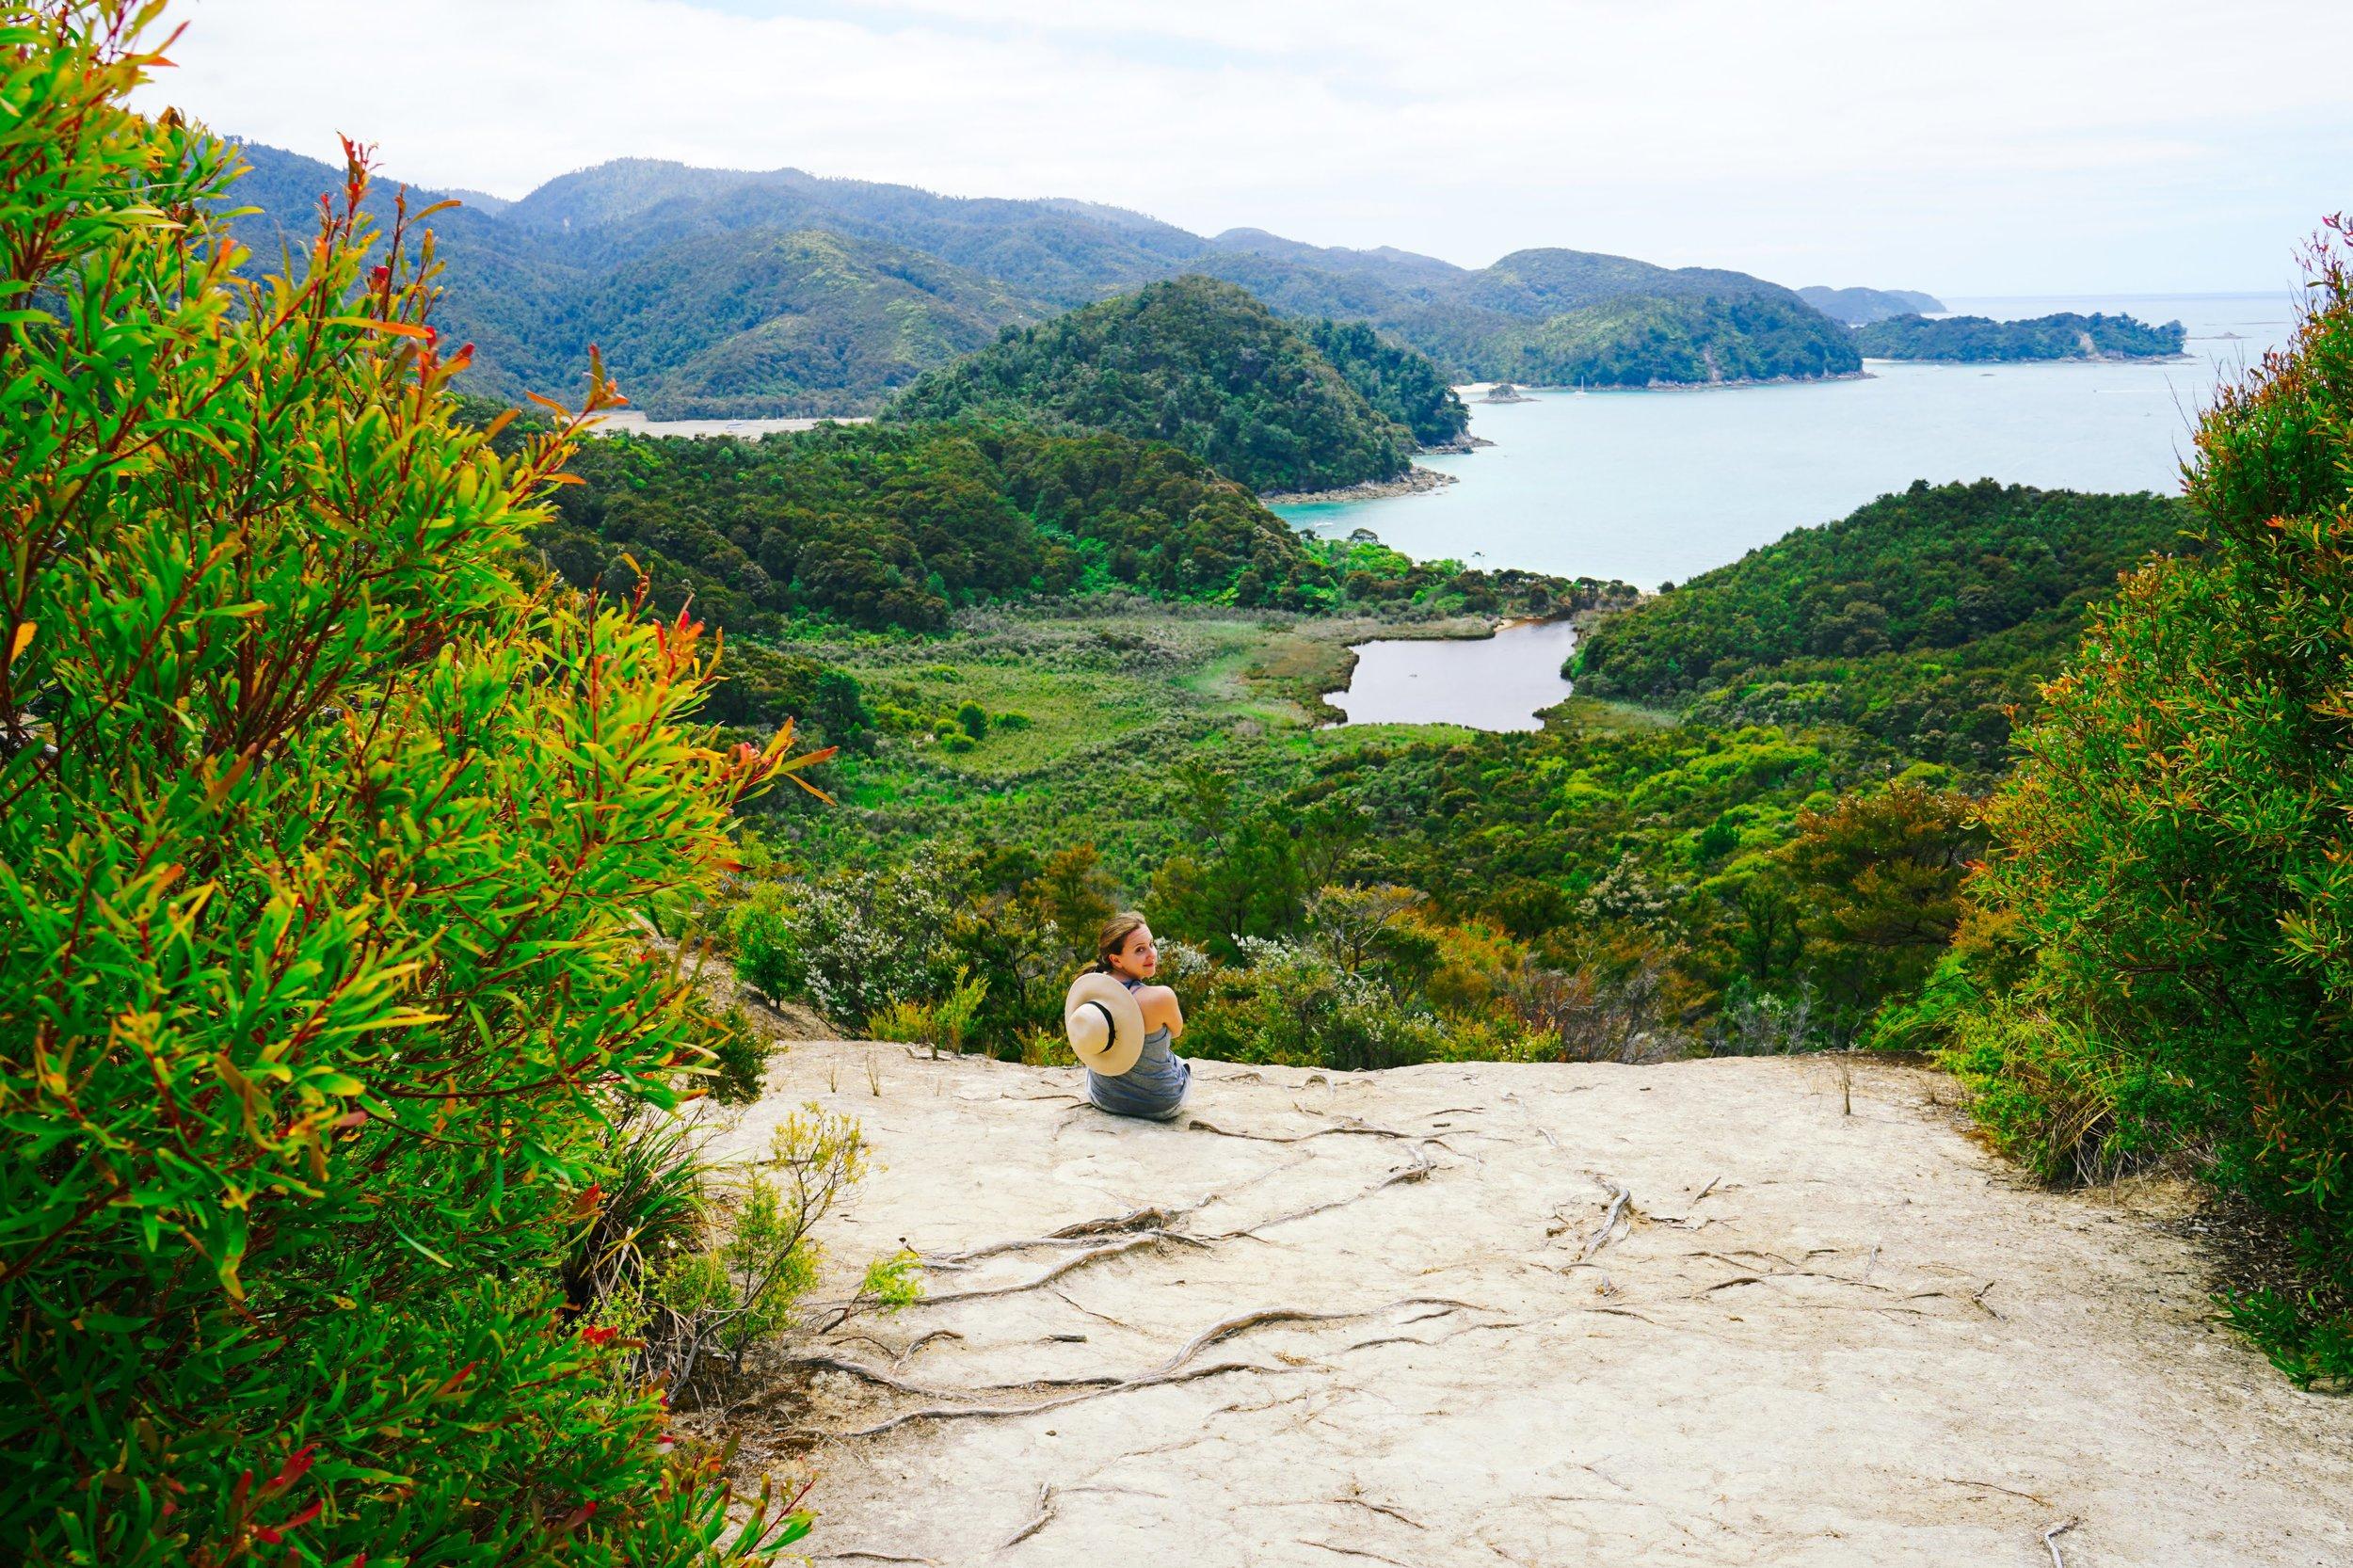 Hiking in Abel Tasman National Park, New Zealand